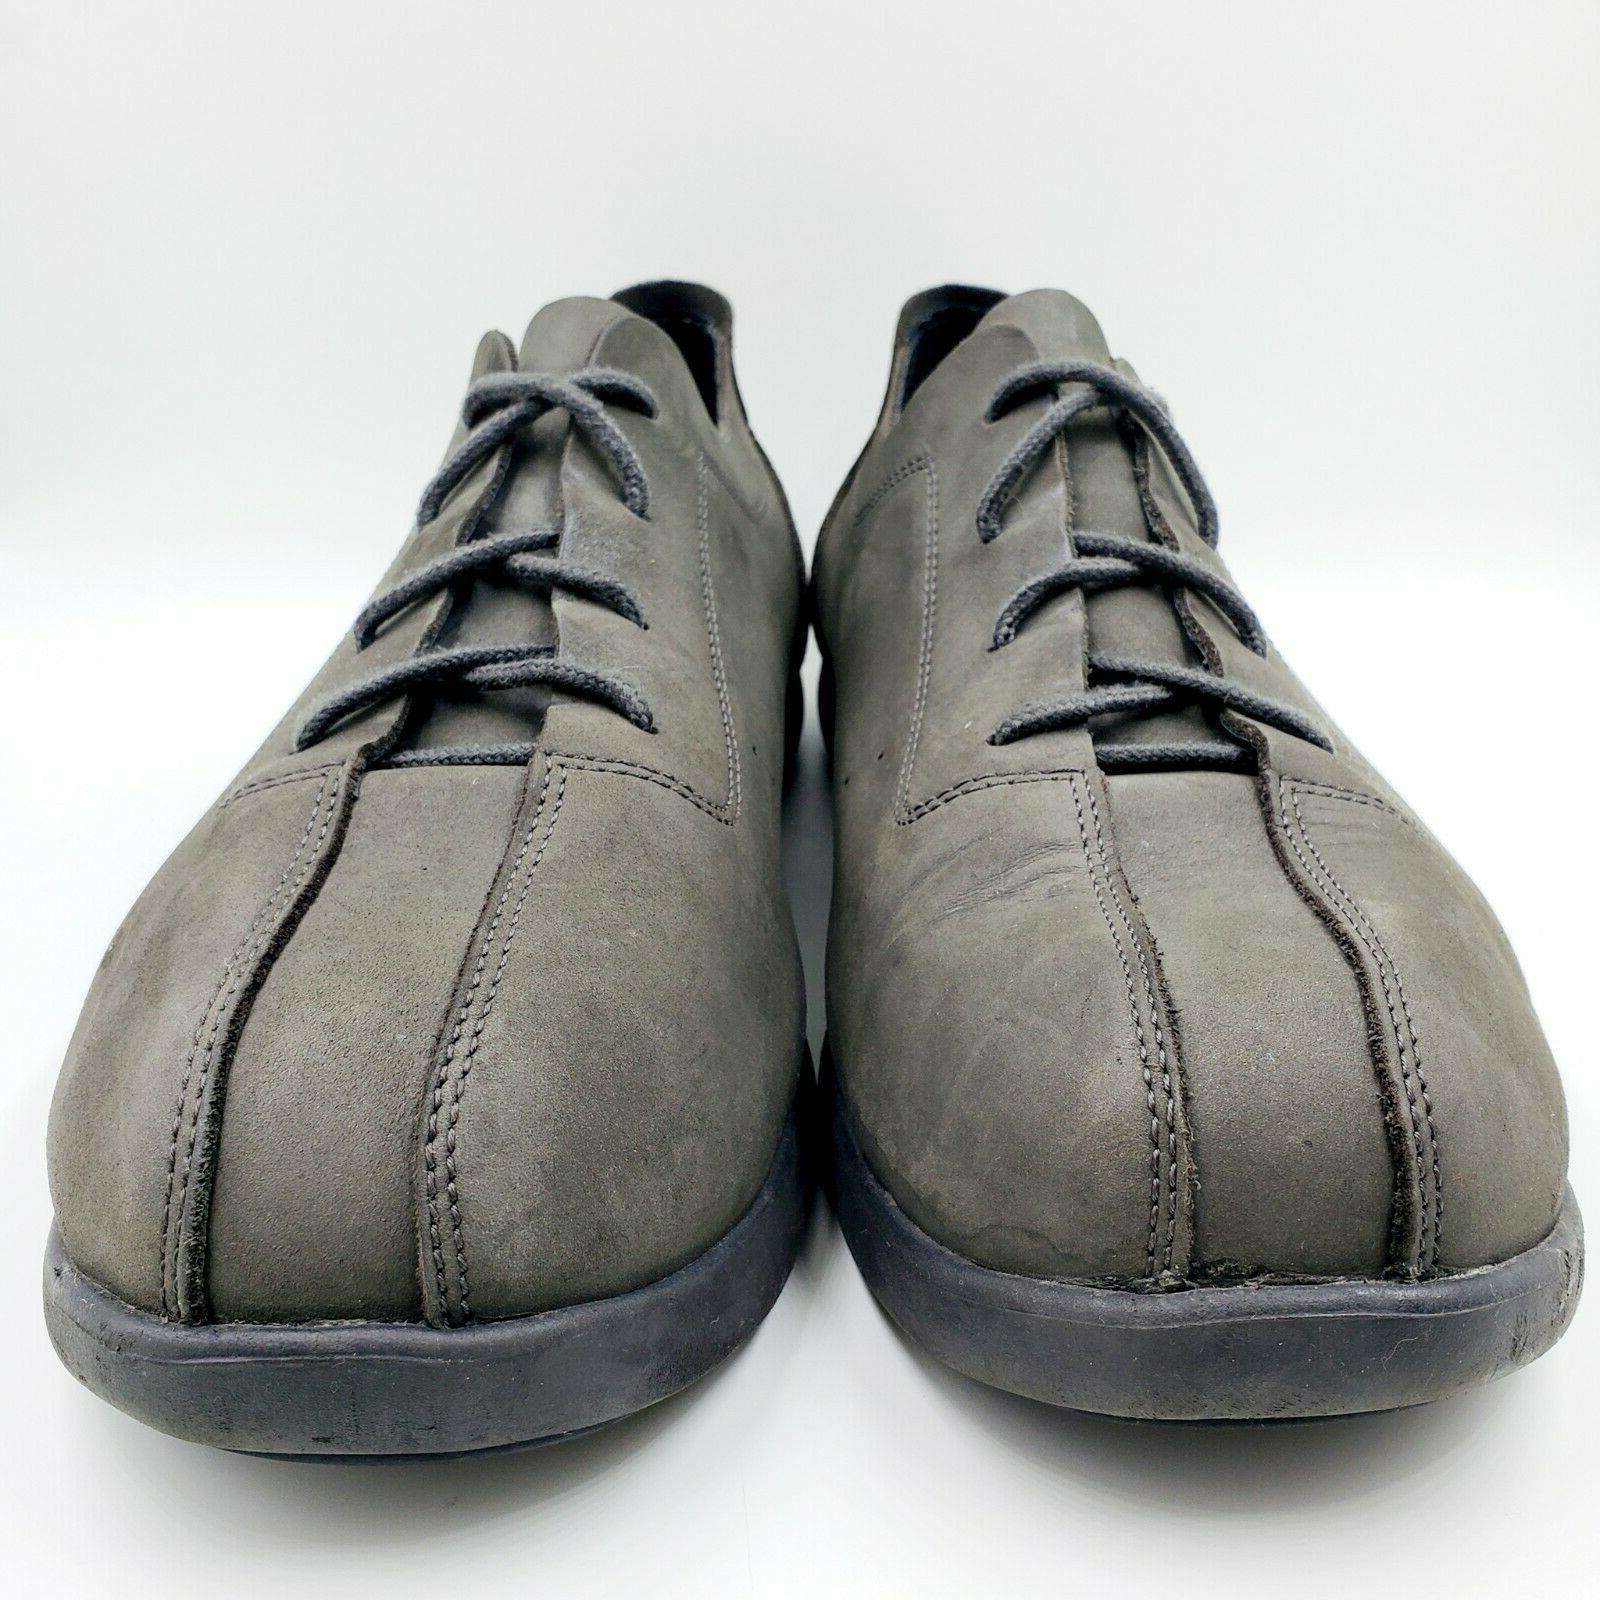 Crocs Venture Leather Casual Oxford